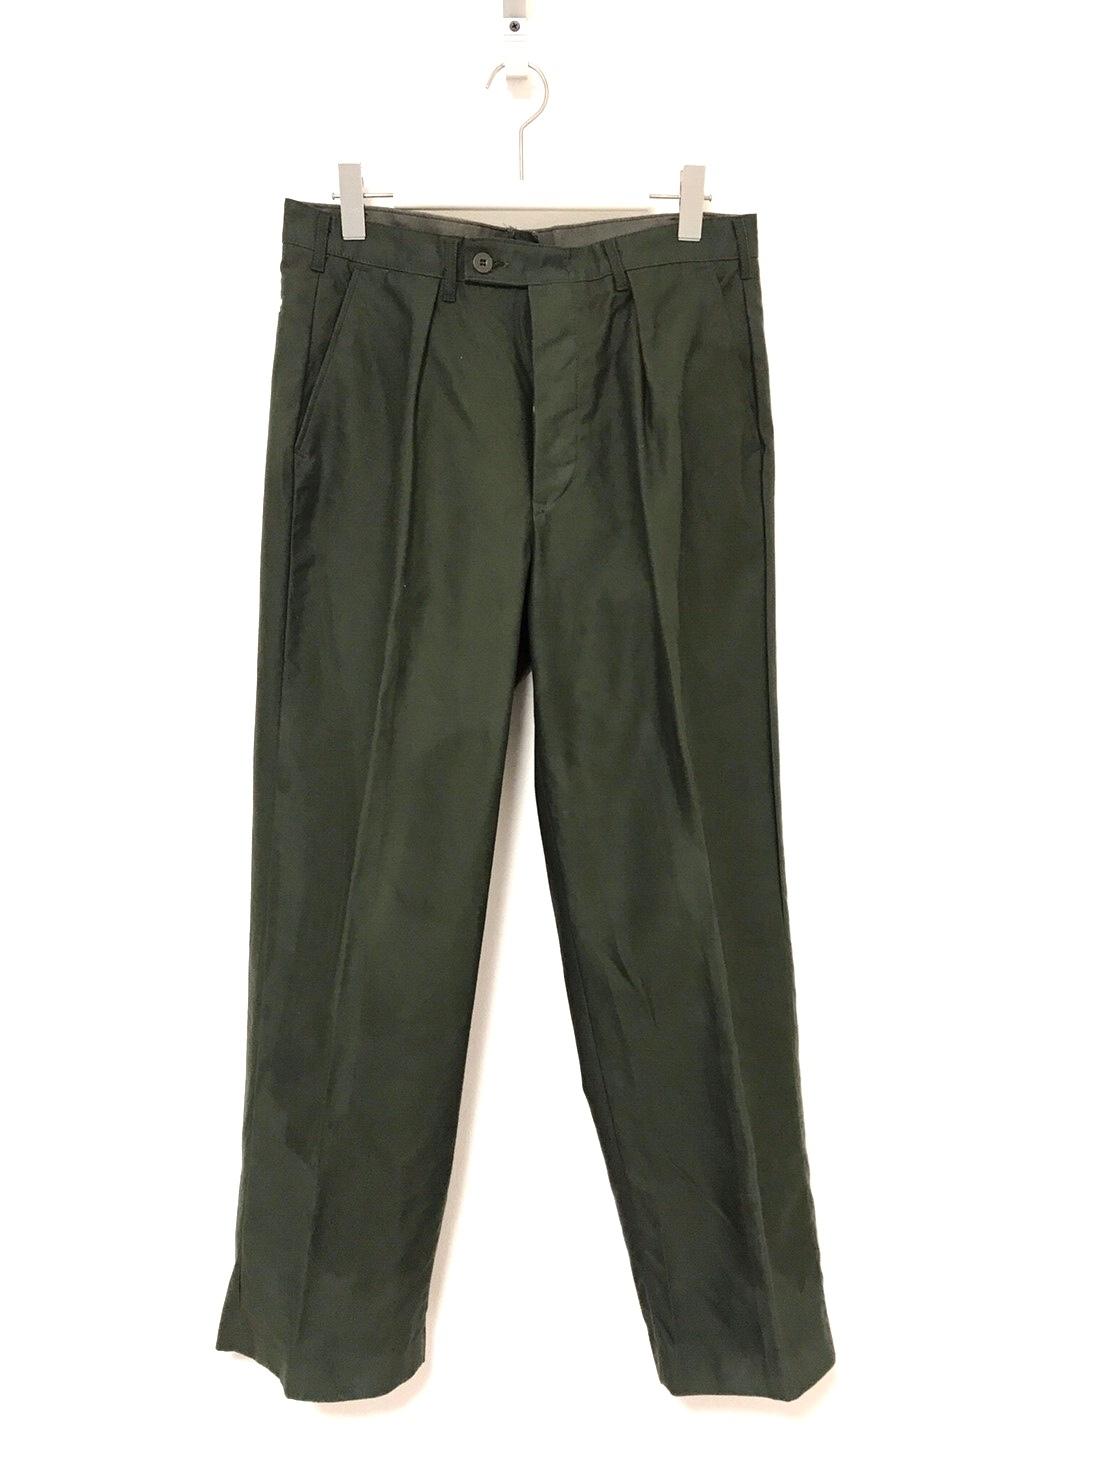 70's Dead Stock Swedish Army Utility Pants C96